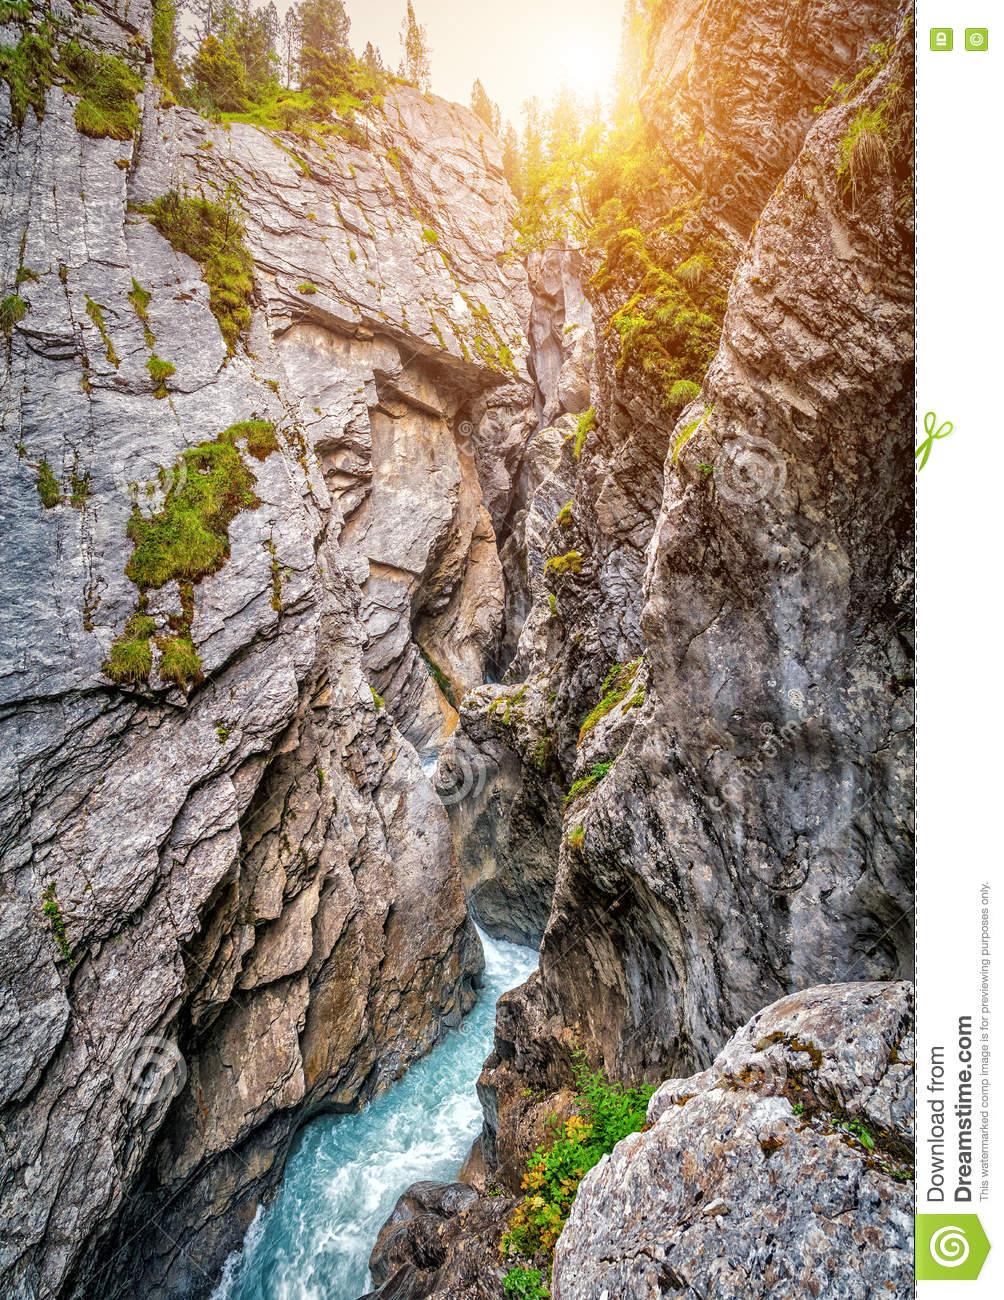 Famous Mystical Rosenlaui Glacier Gorge (Rosenlaui.